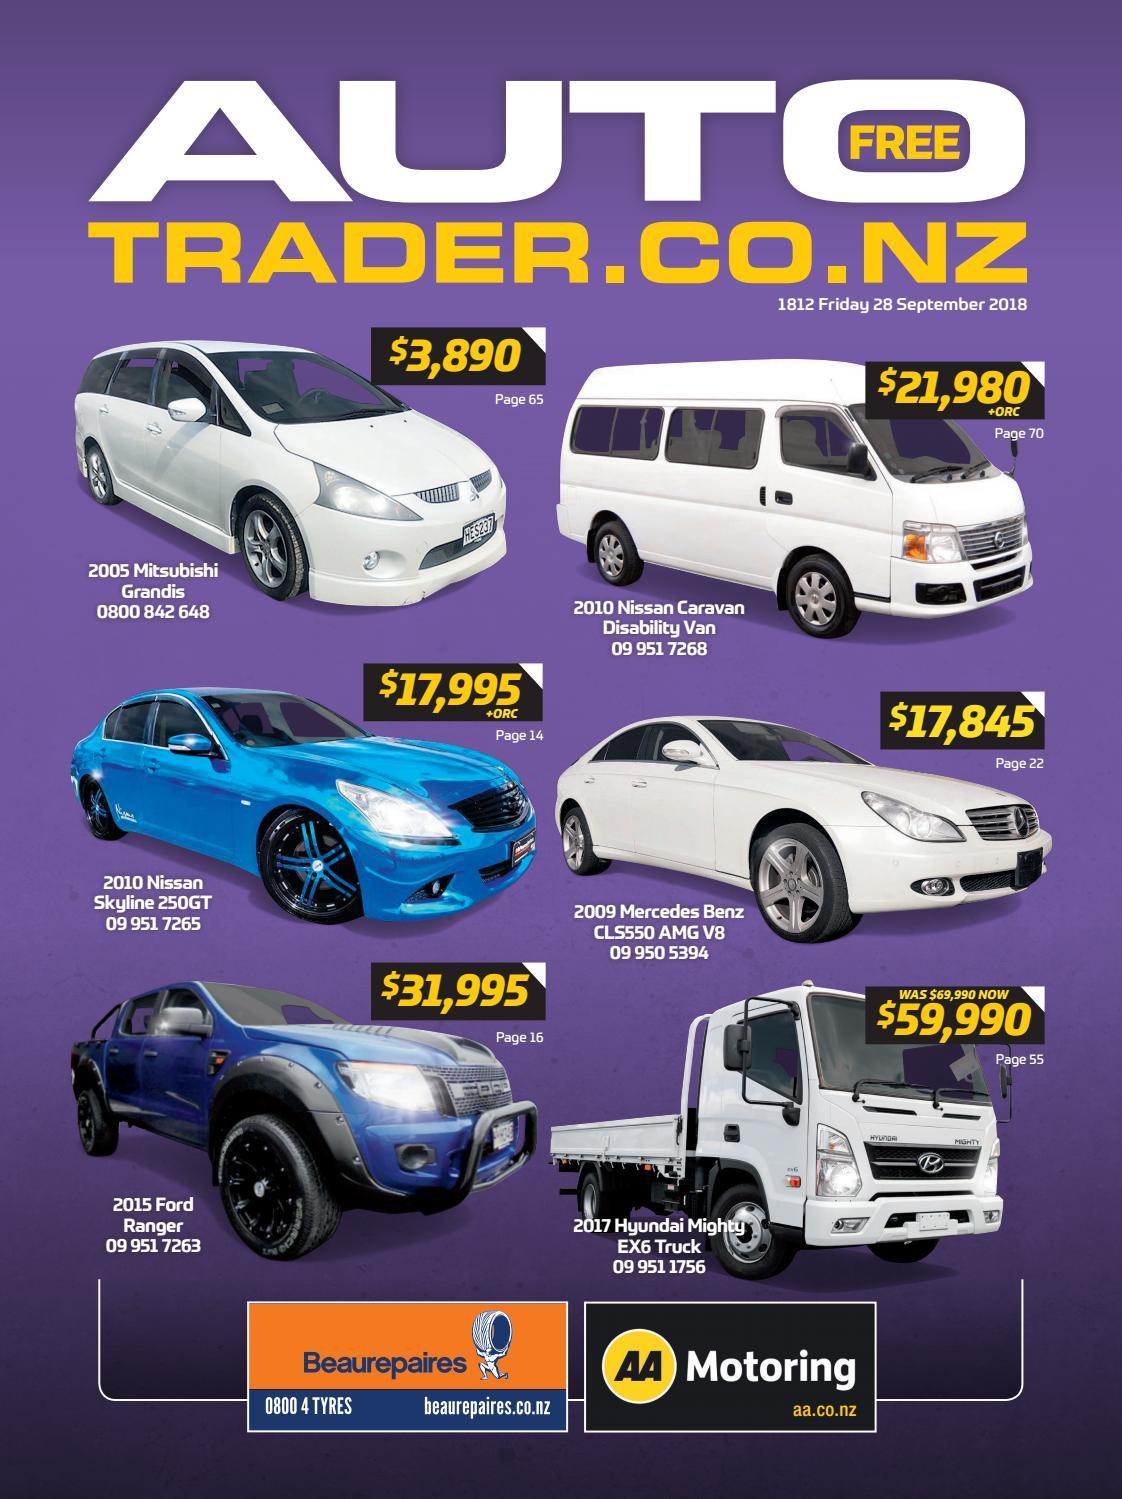 Autotrader Nz Issue 1812 By Autotradernz Issuu Toyota Landcruiser With 22 Inch Custom Rims